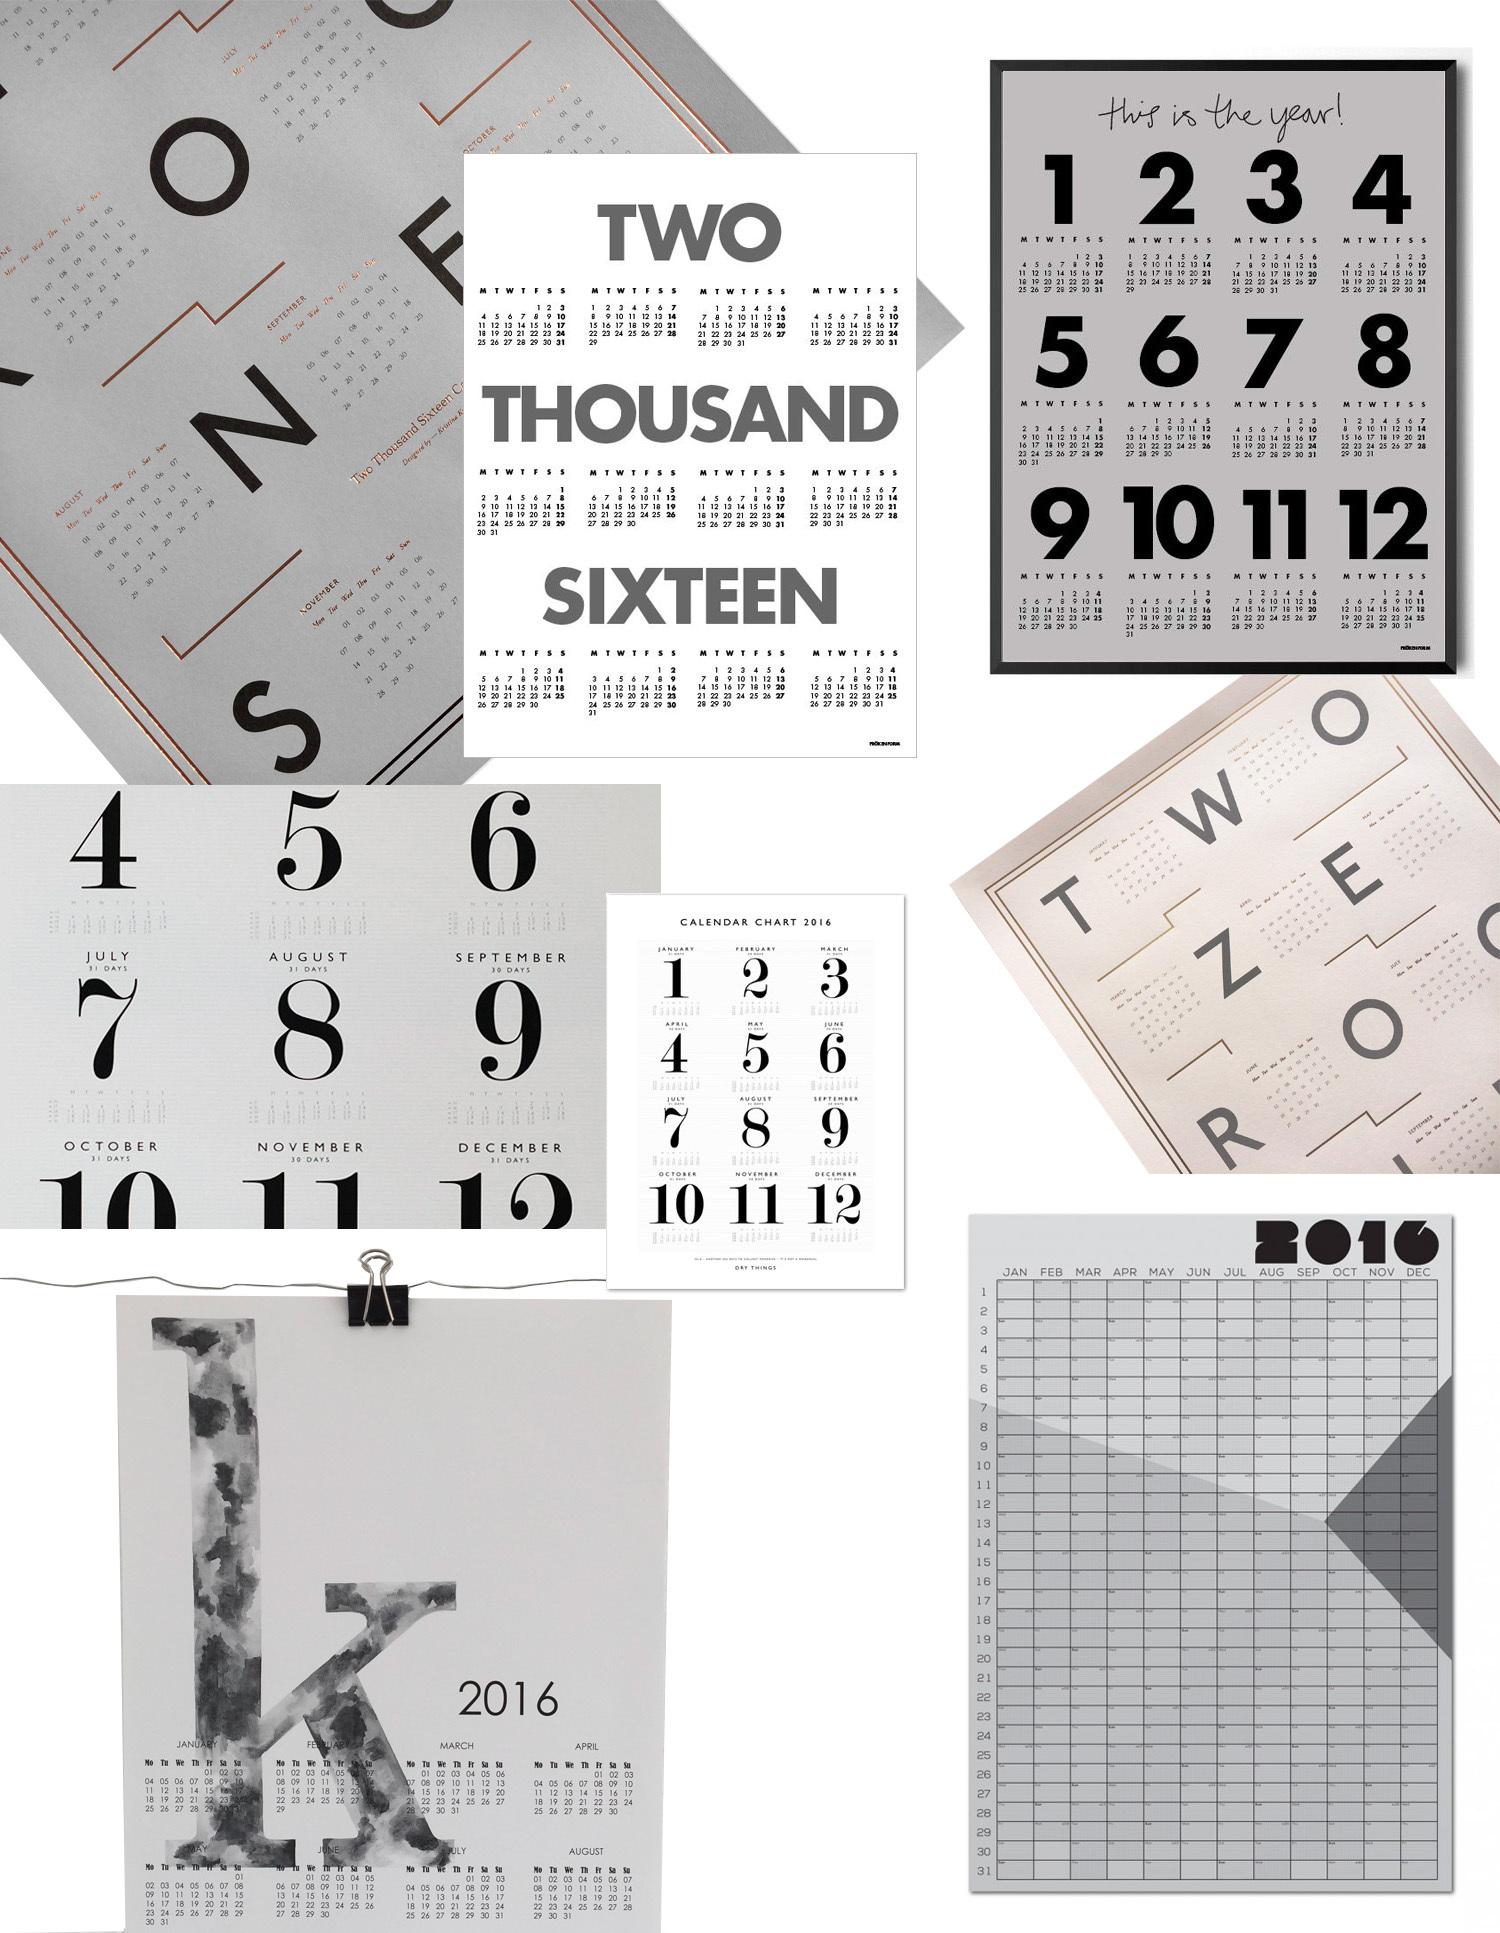 Kalendertips 2016 - fixaodona.se